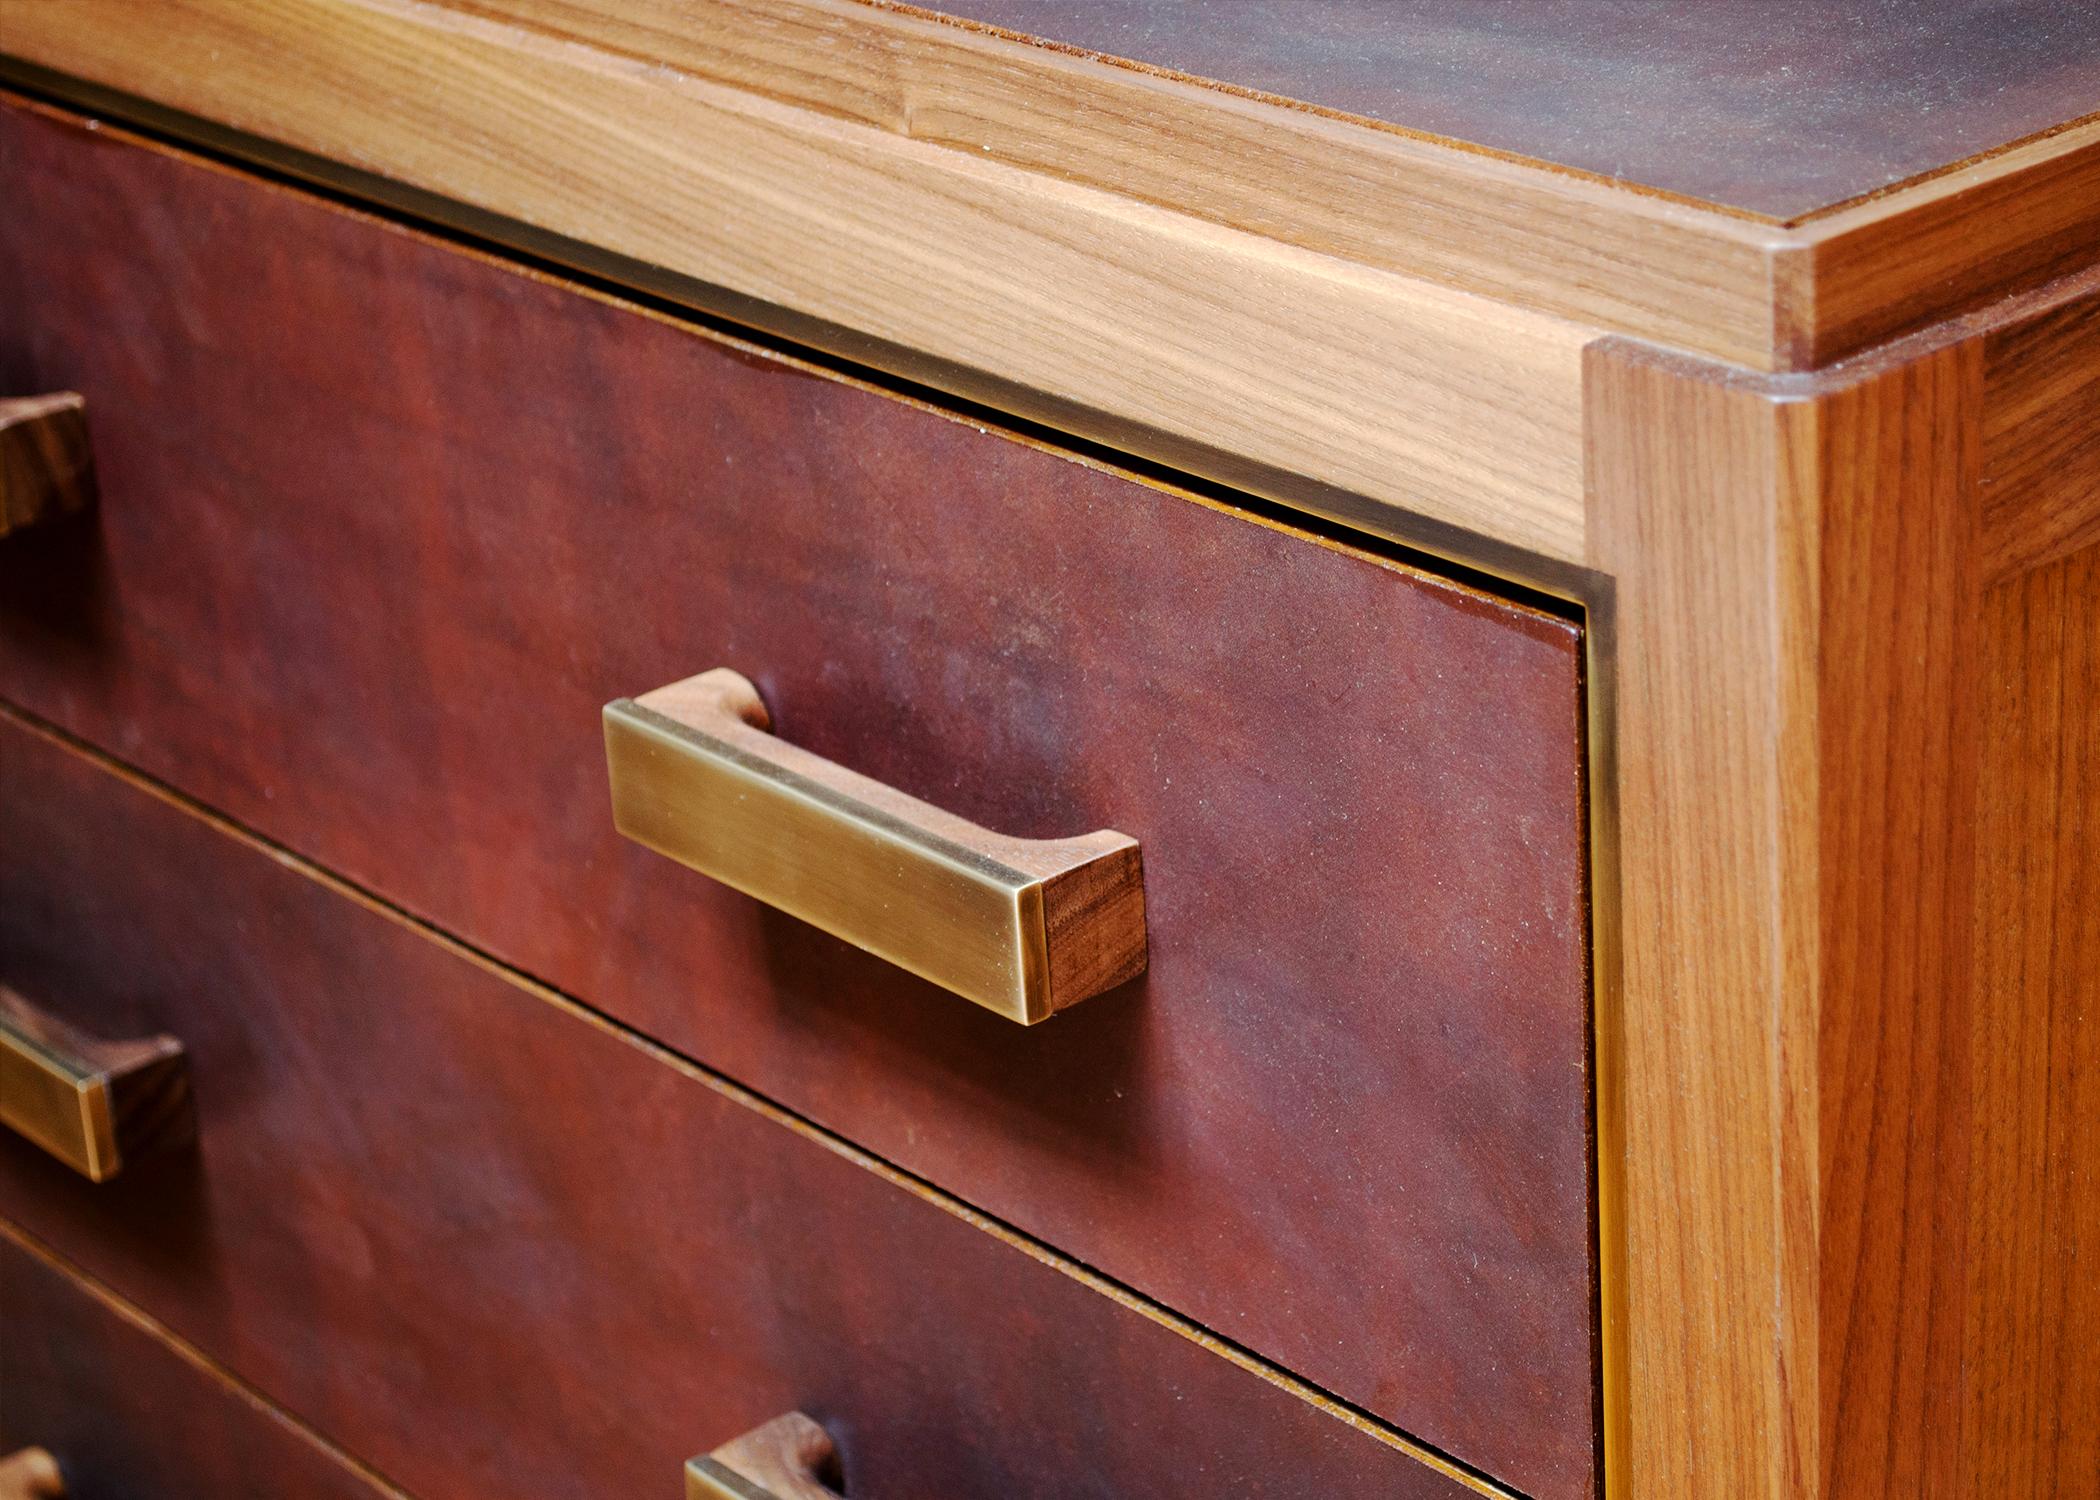 Abuelo_Bureau_3-drawer_AL_edit_horizontal_detail.jpg